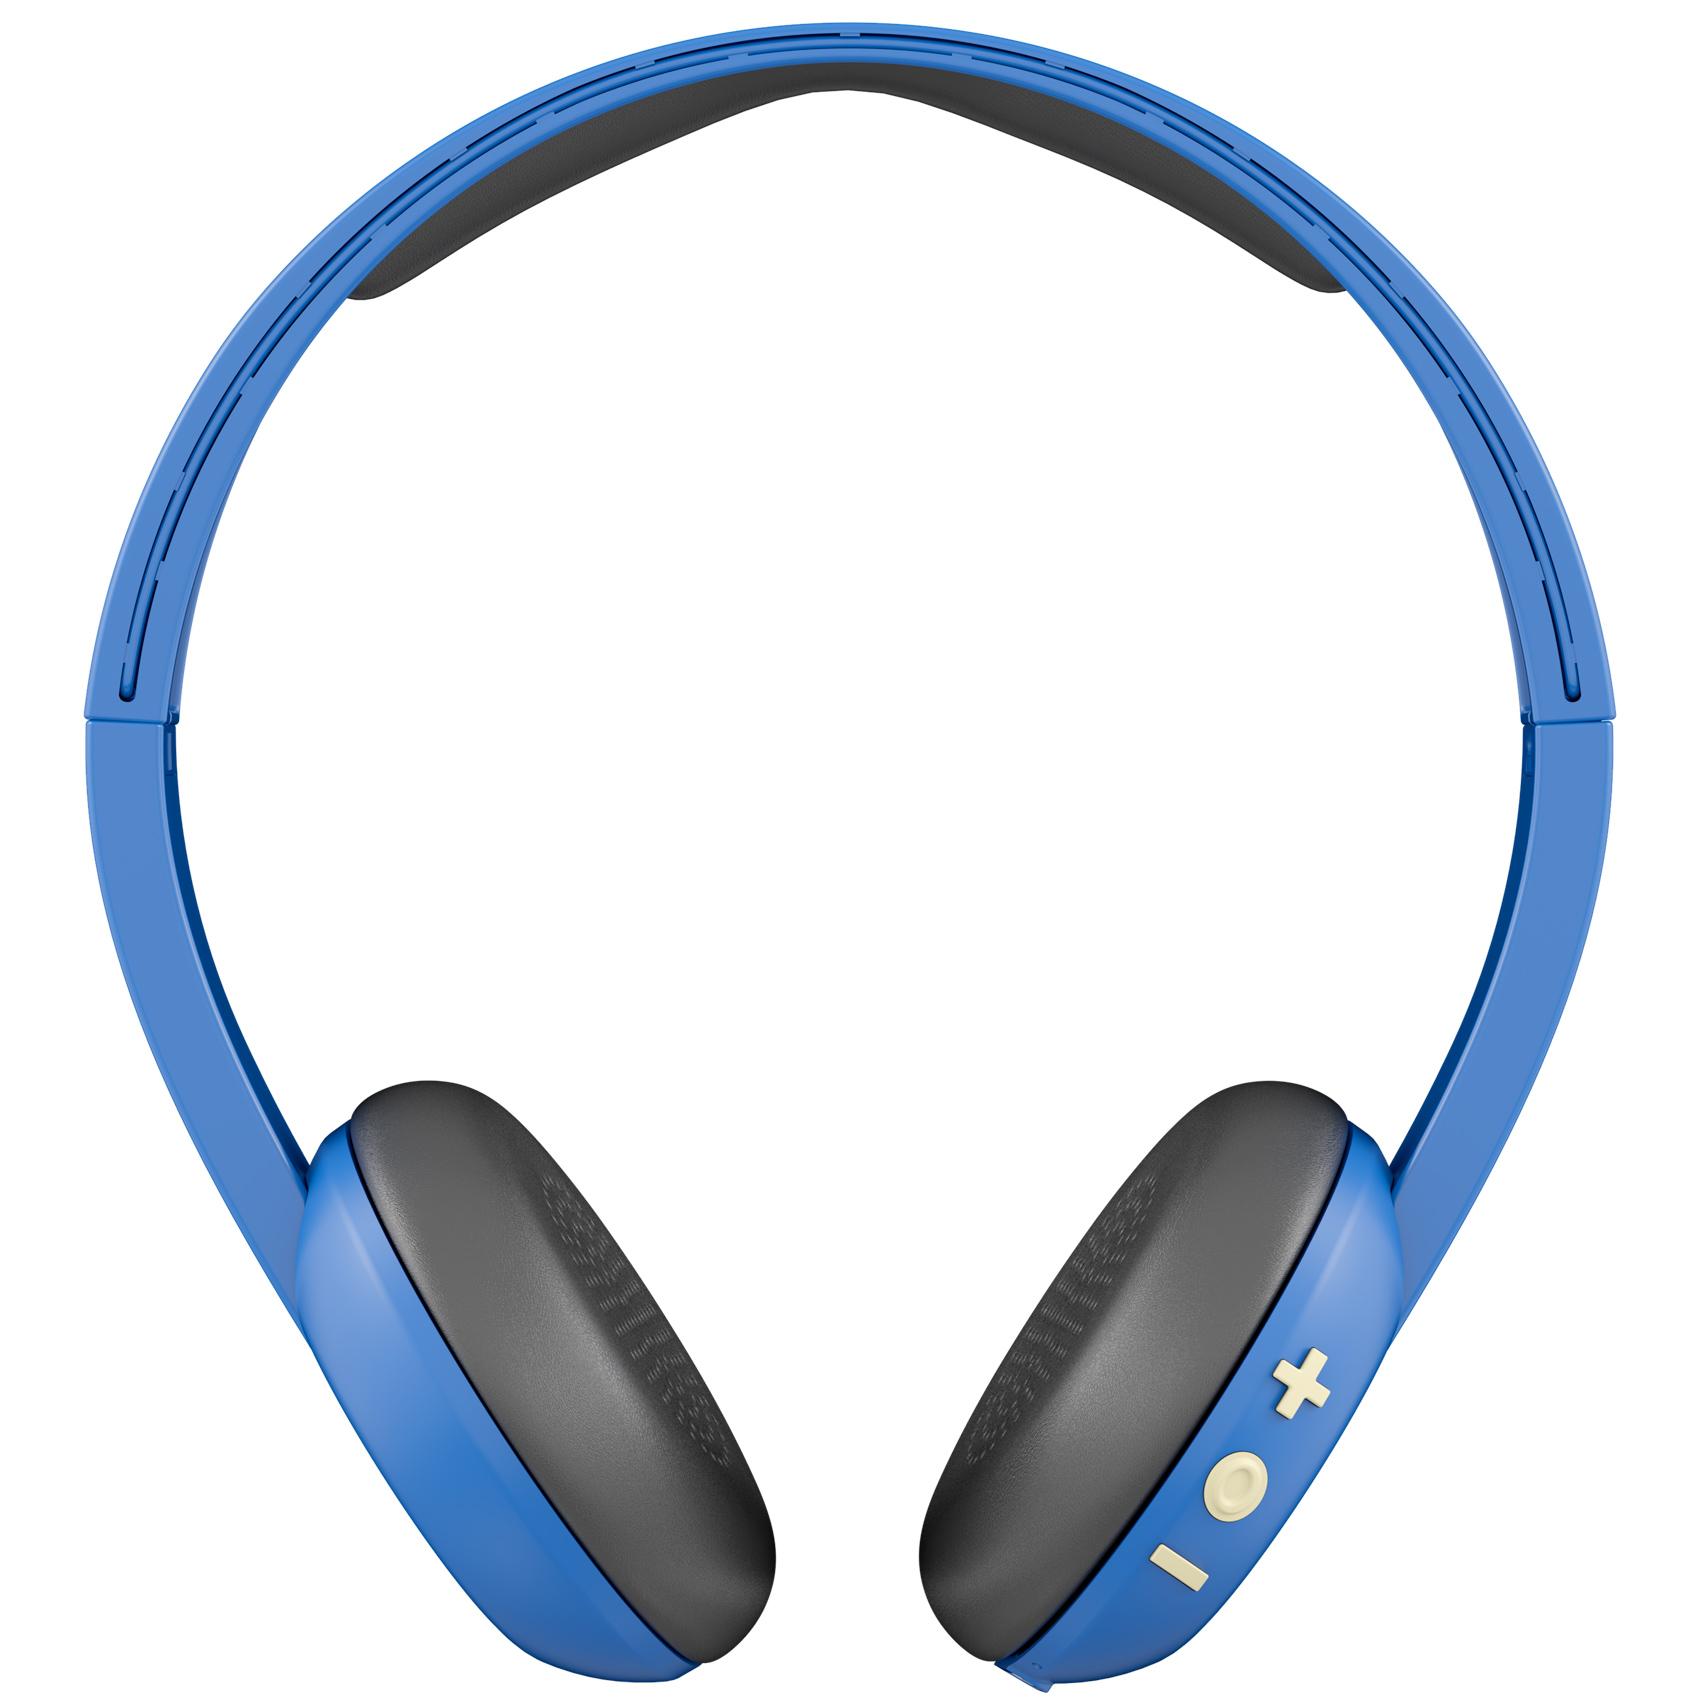 47491eaf7eb Skullcandy-Bluetooth-Headphones-Uproar-Wireless-On-Ear-Microphone-